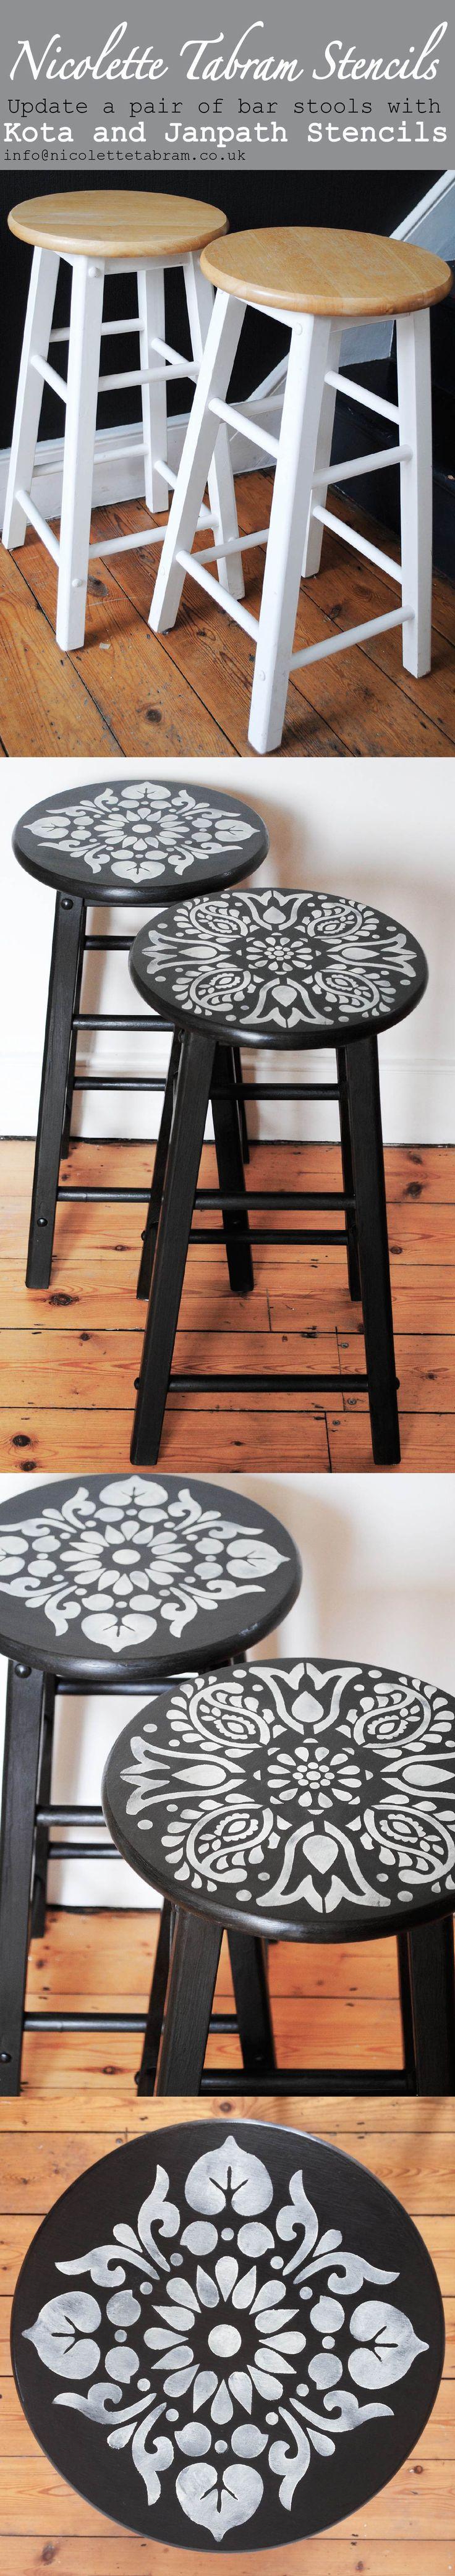 Best 20+ Painted bar stools ideas on Pinterest